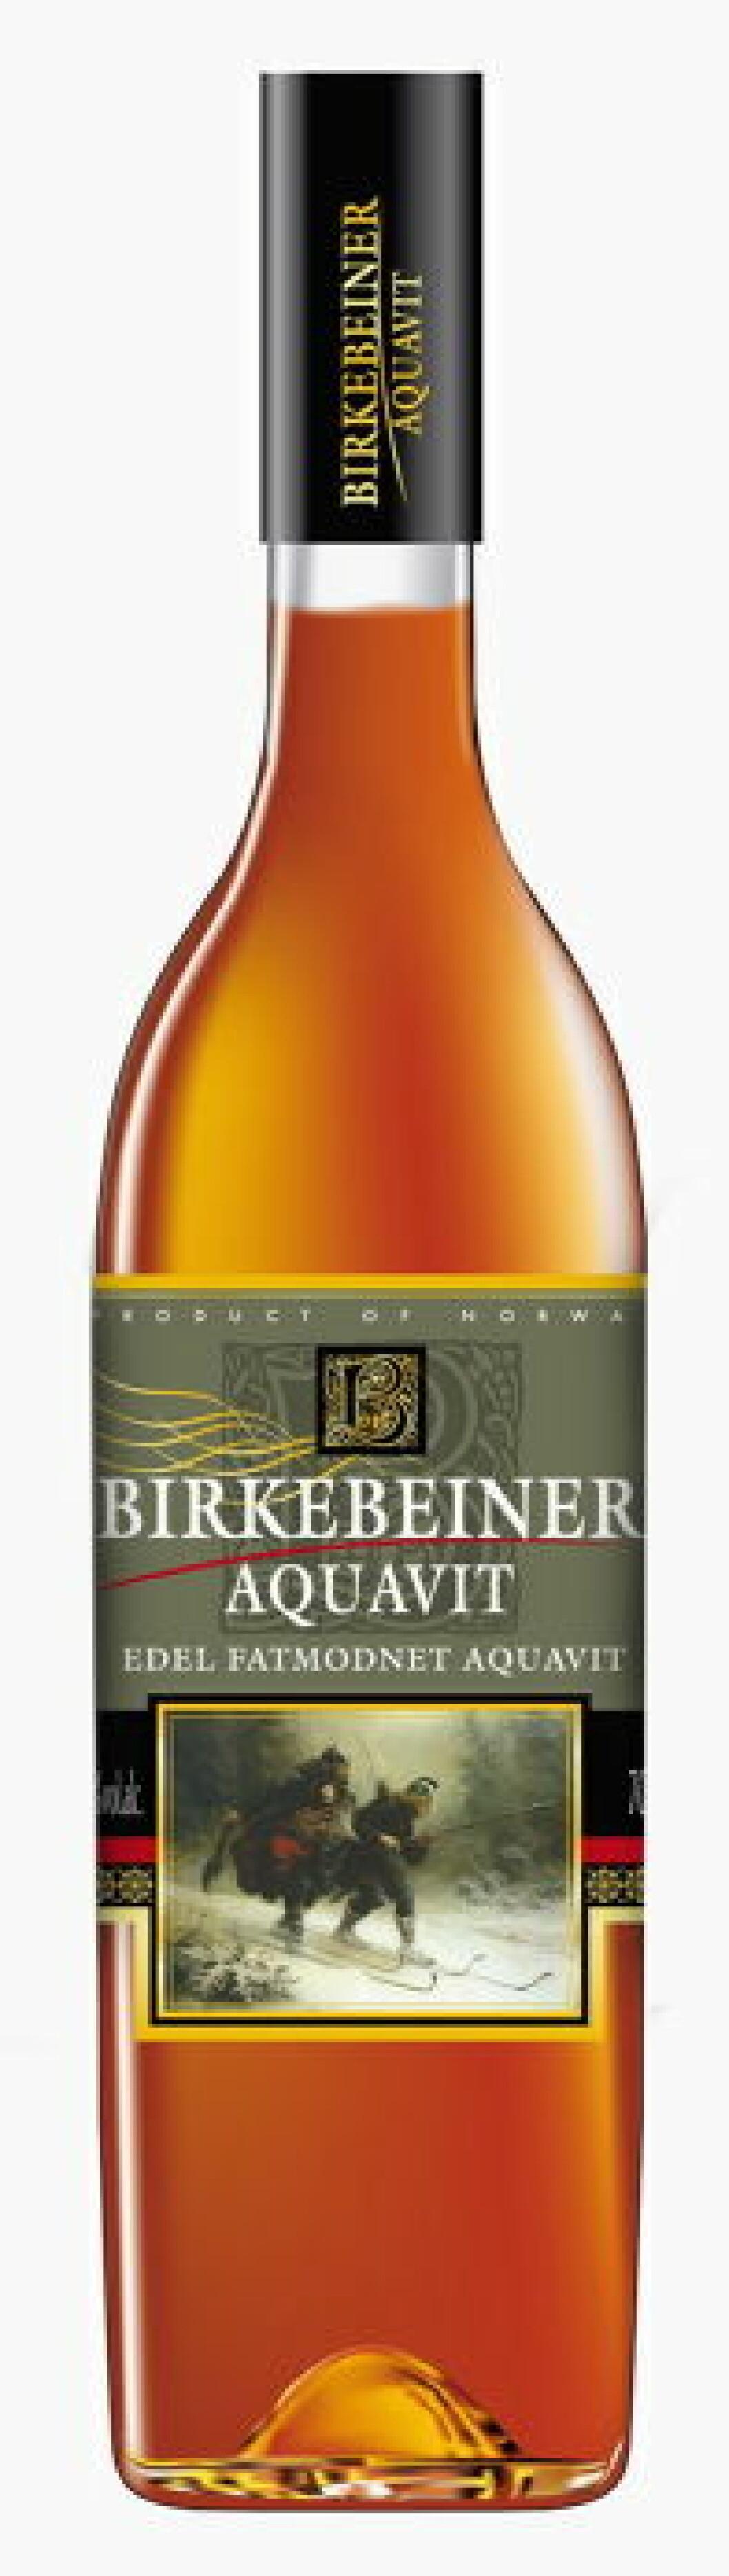 Birkebeiner Aquavit nett